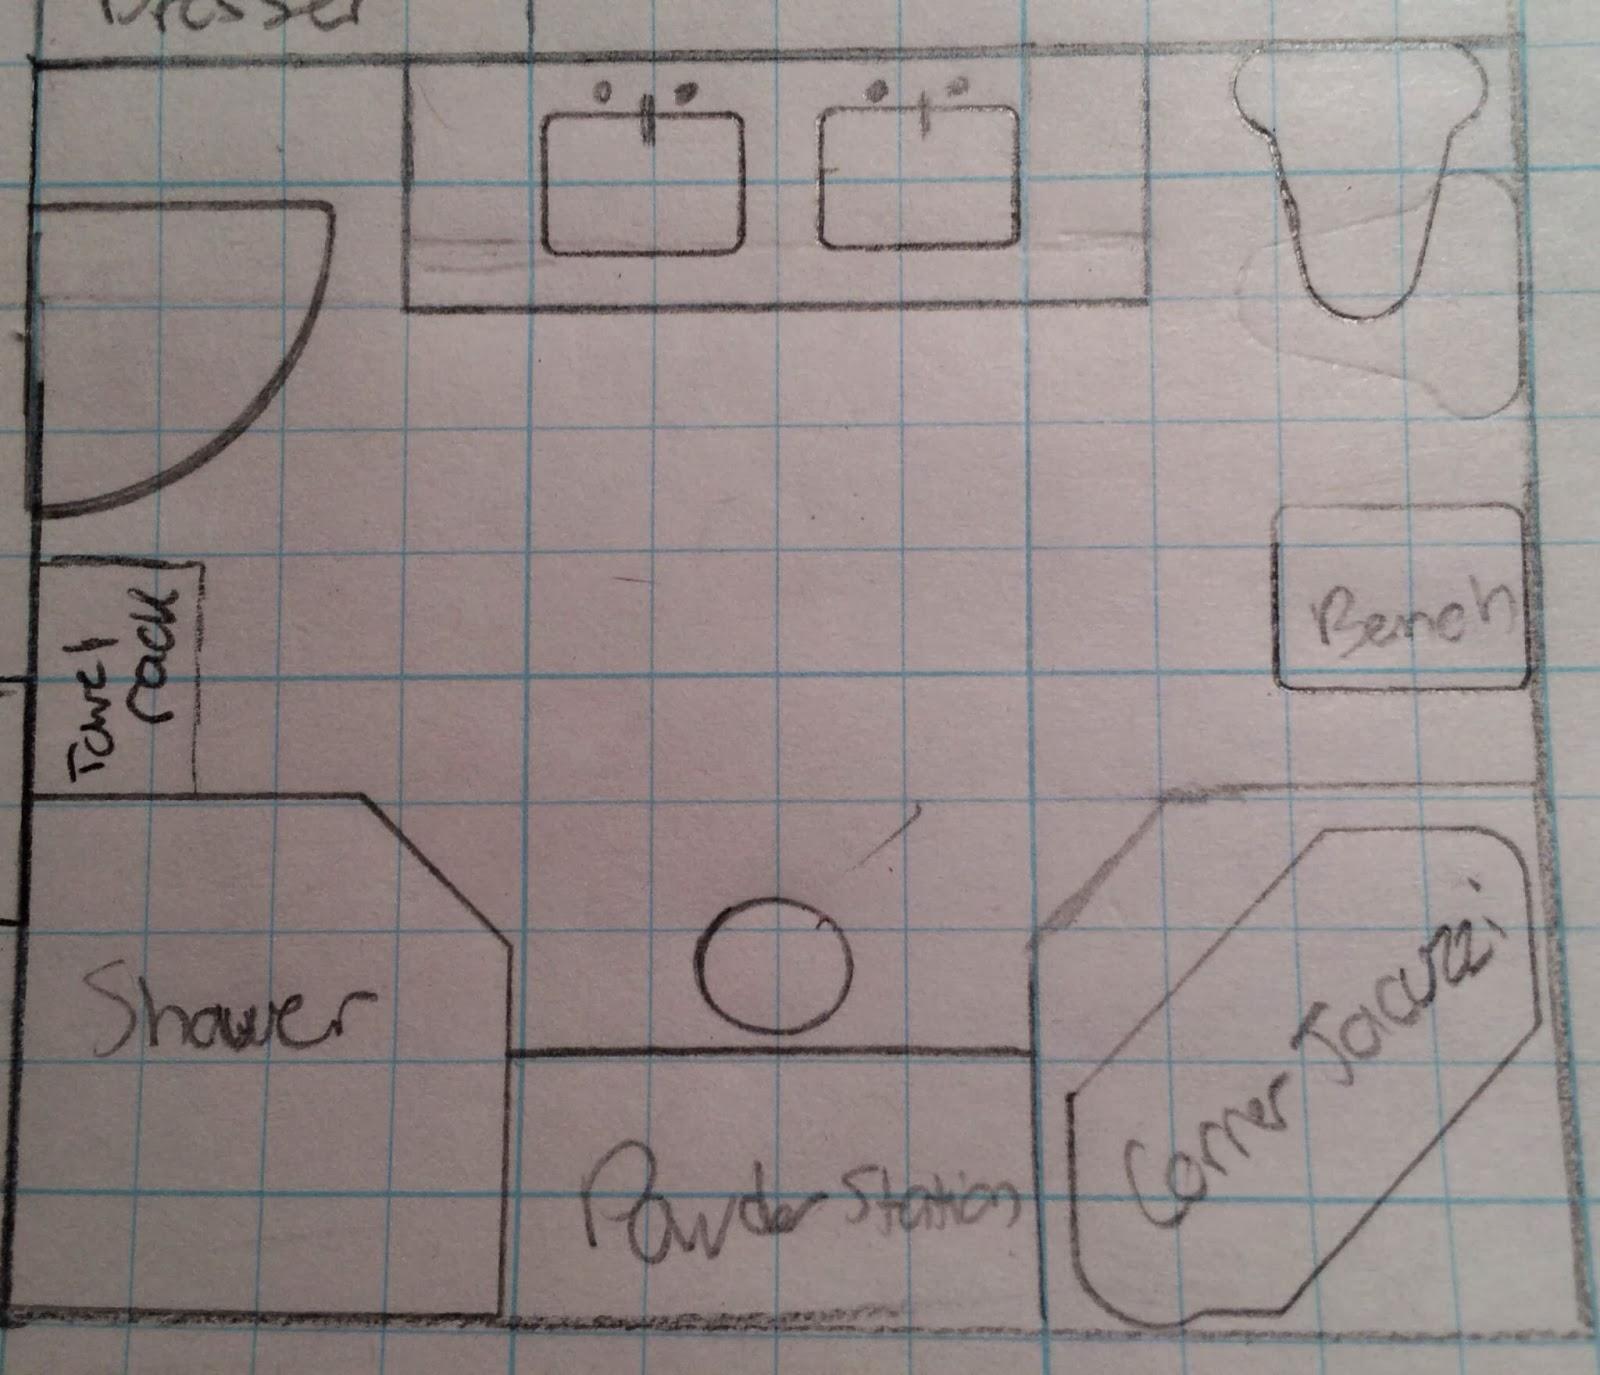 Beautiful Bath Shower Tile Designs Thin Master Bath Showers Rectangular Vintage Style Bathtubs Cheap Bathtub Brisbane Youthful Brass Bathroom Wall Sconce Purple3 Bedroom 3 Bath Apartments In Atlanta Ga 8 X 10 Master Bathroom Layout   Rukinet